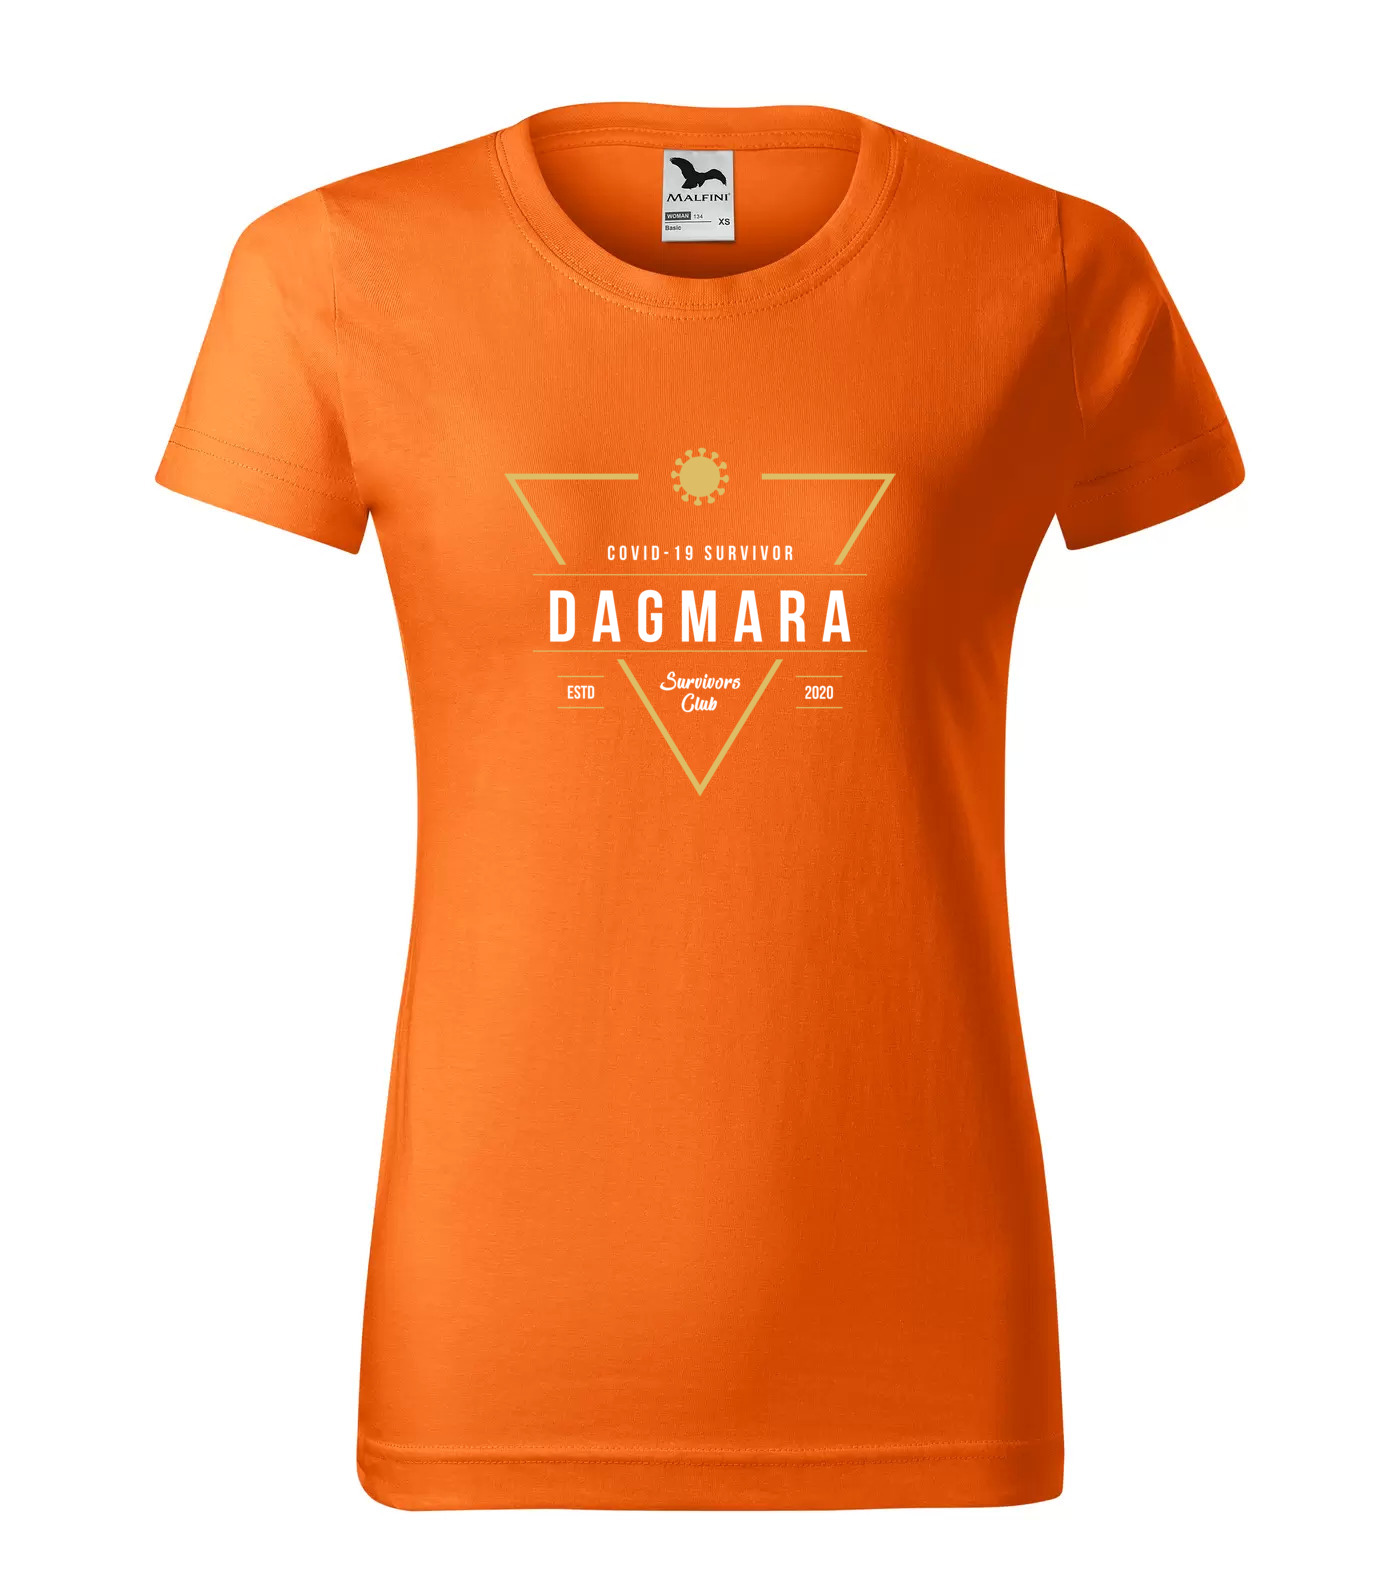 Tričko Survivor Club Dagmara